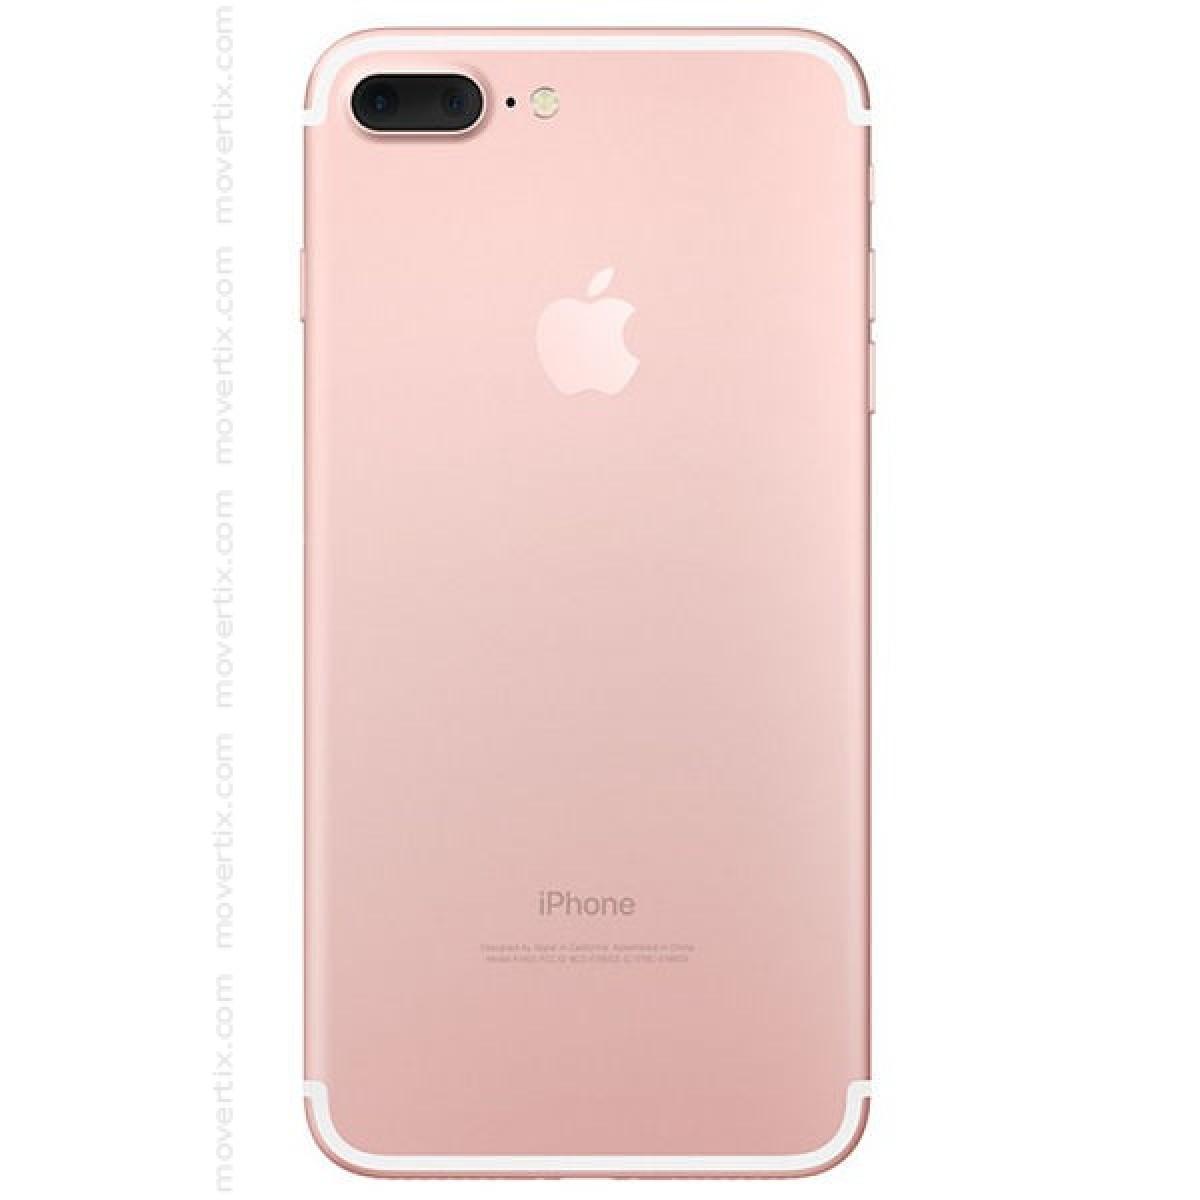 apple iphone 7 plus rose gold 32gb 190198157164 movertix mobile phones shop. Black Bedroom Furniture Sets. Home Design Ideas